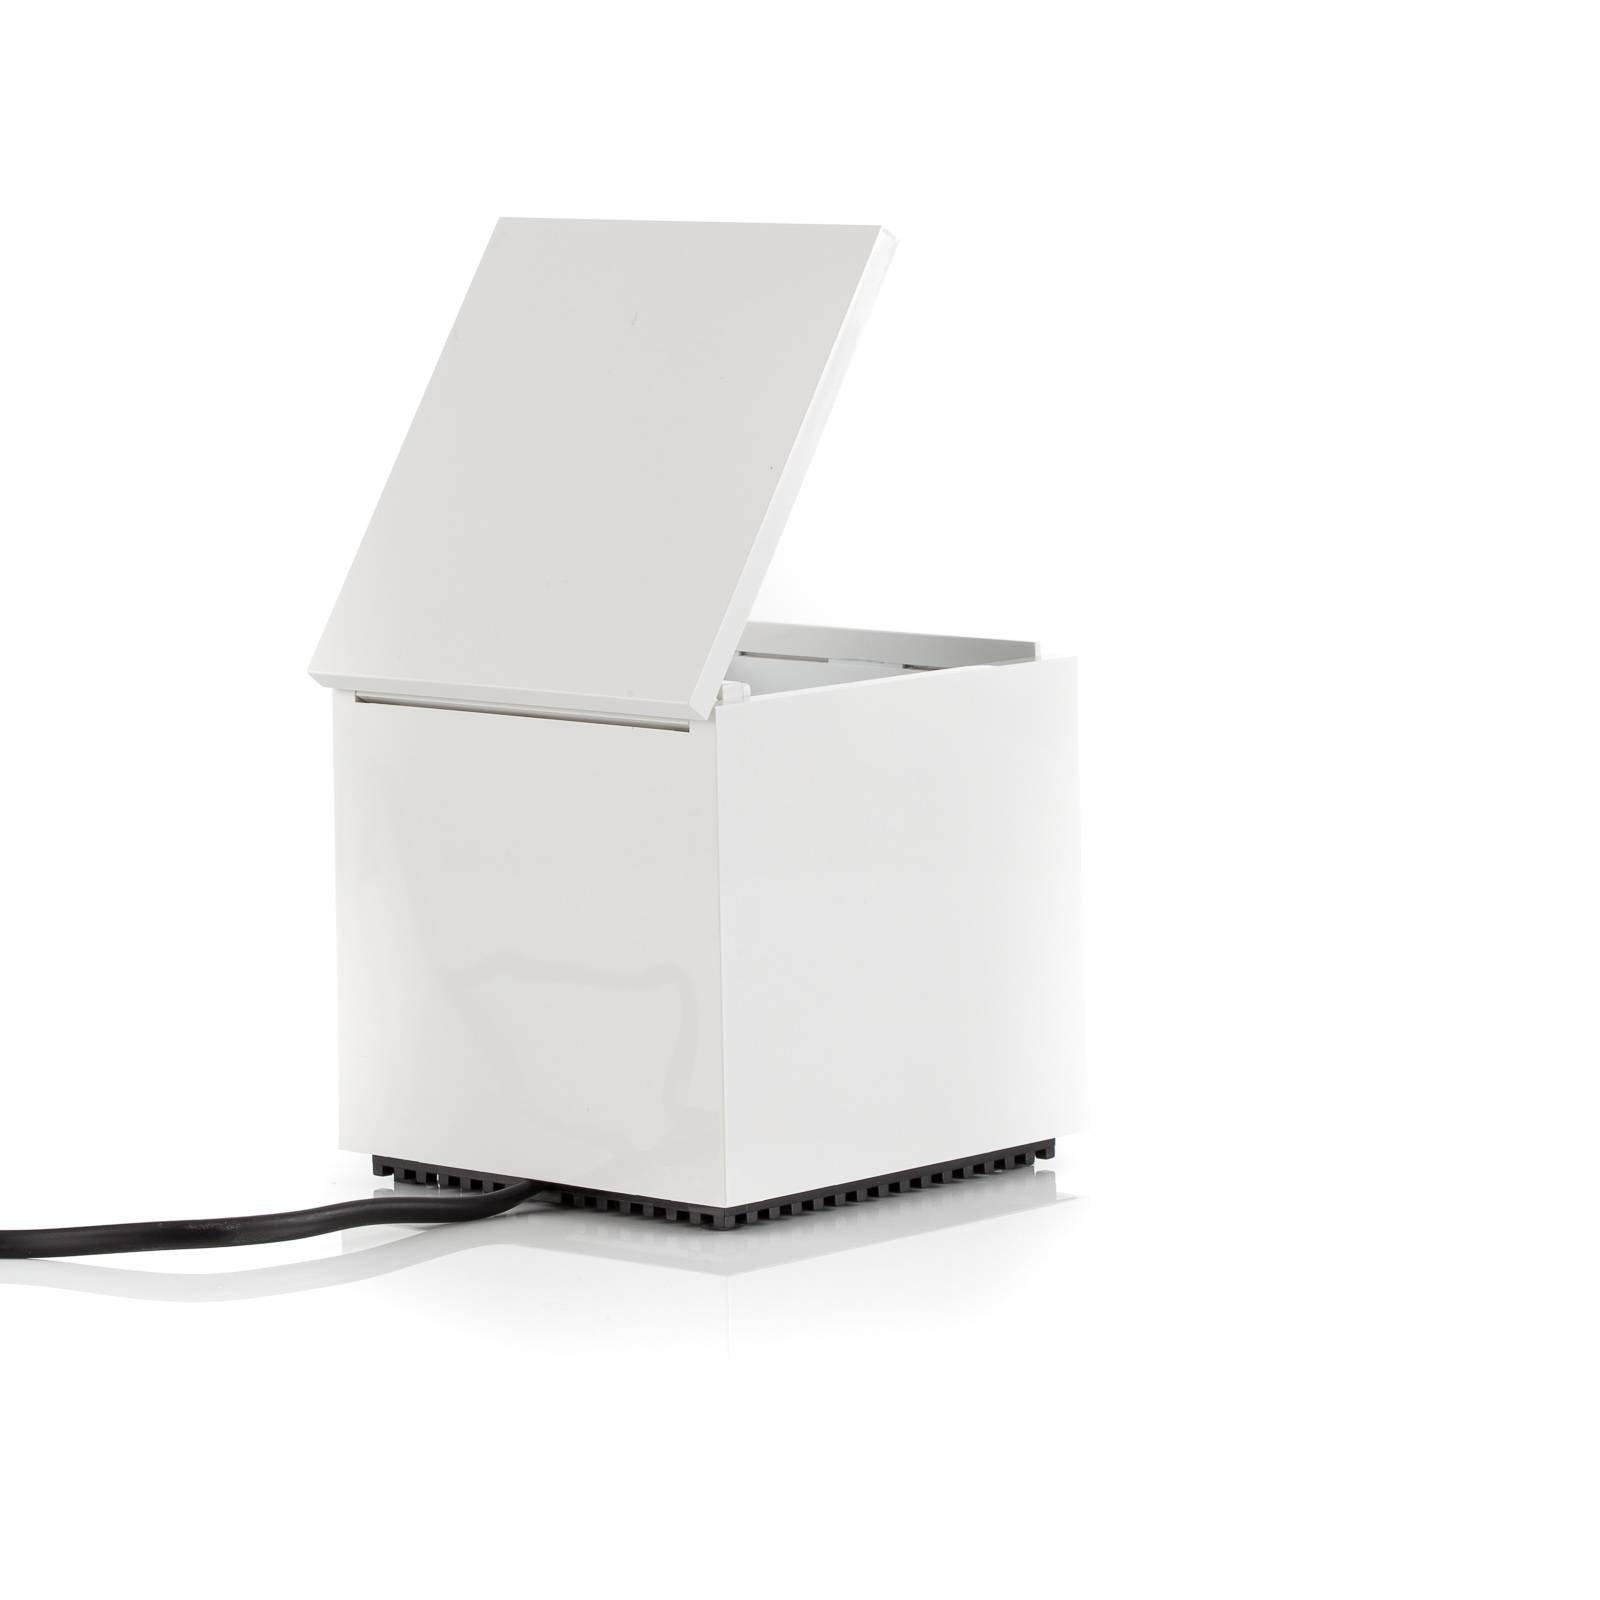 Cini&Nils Cuboluce bordlampe Special Edition 2020